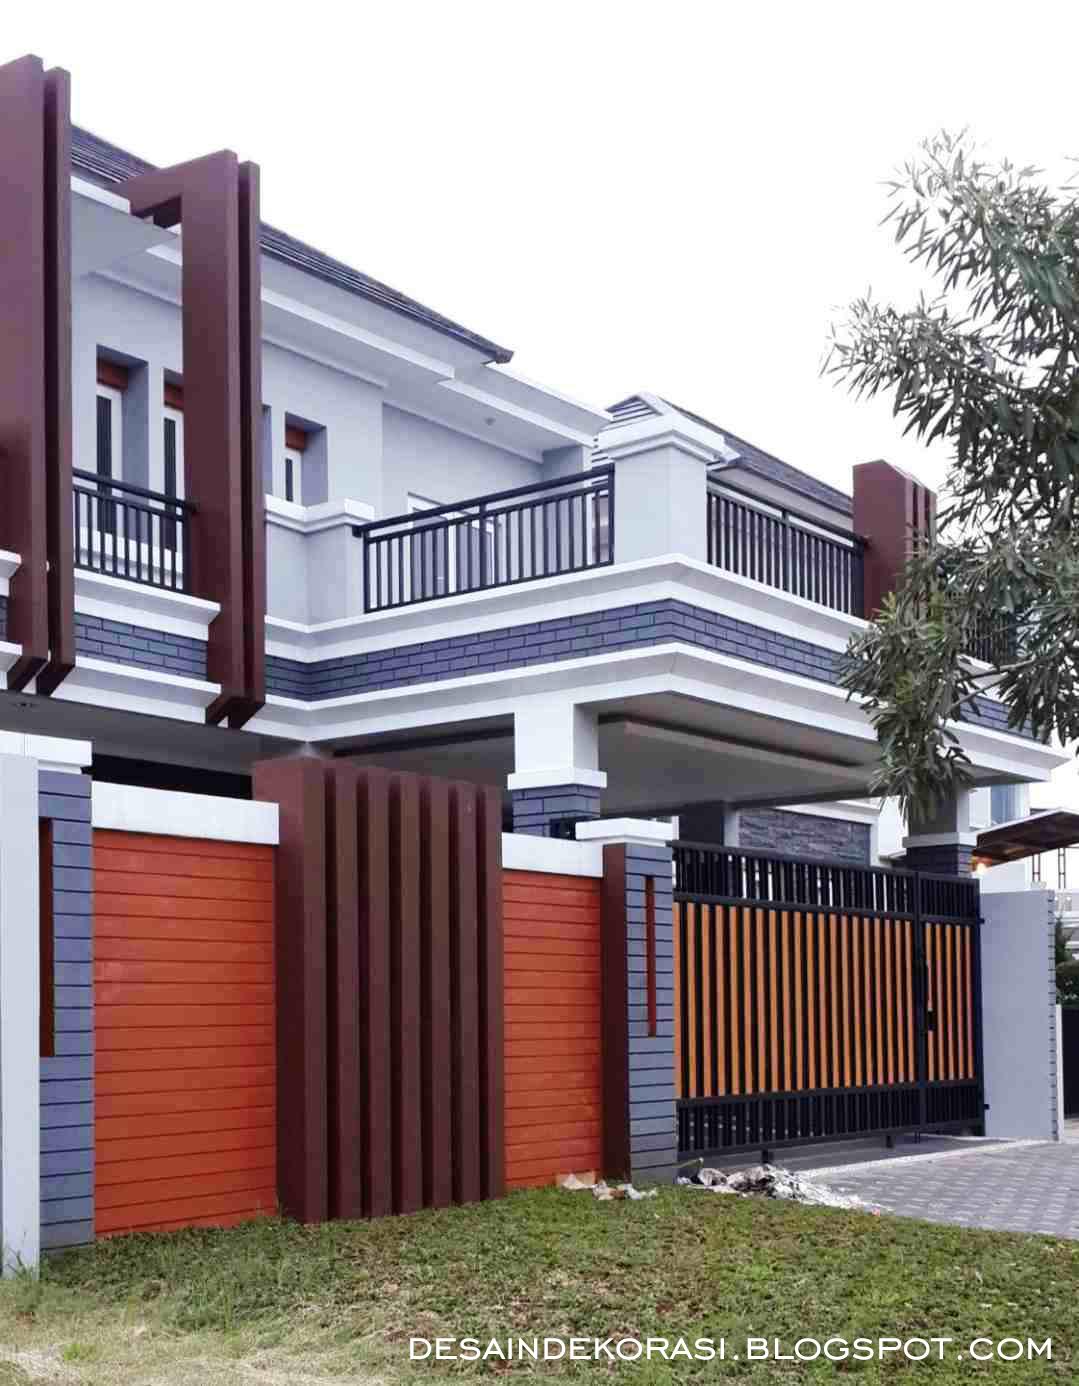 Aneka pagar rumah minimalis dan rekomendasi gambar